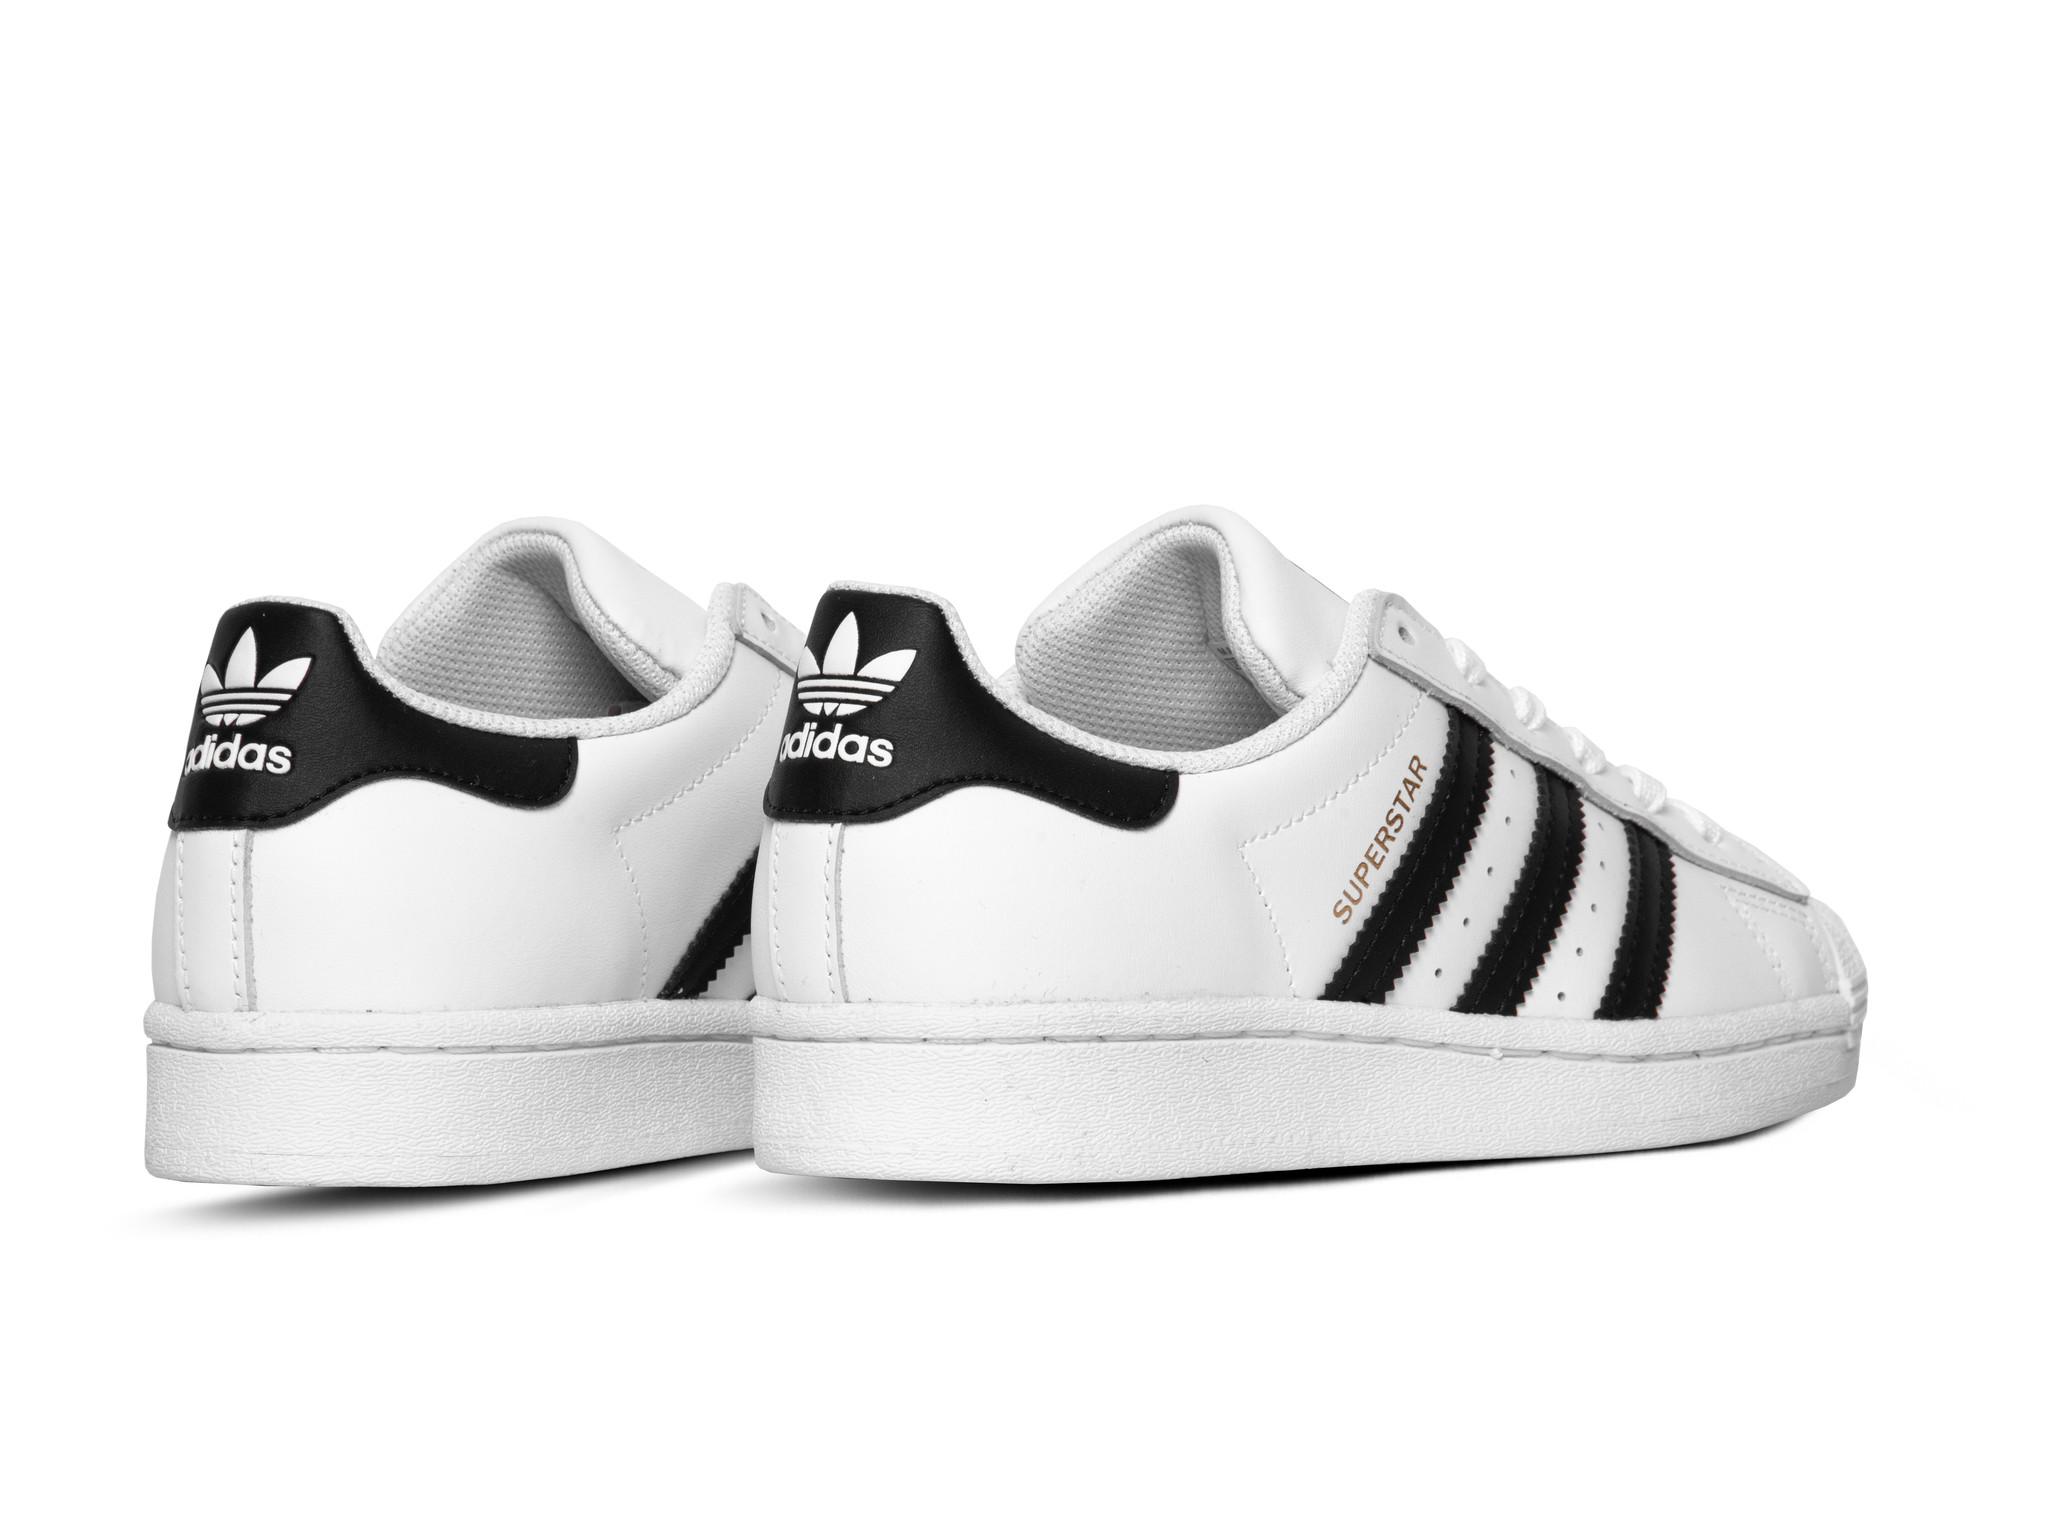 Adidas Superstar Cloud White Core Black EG4958